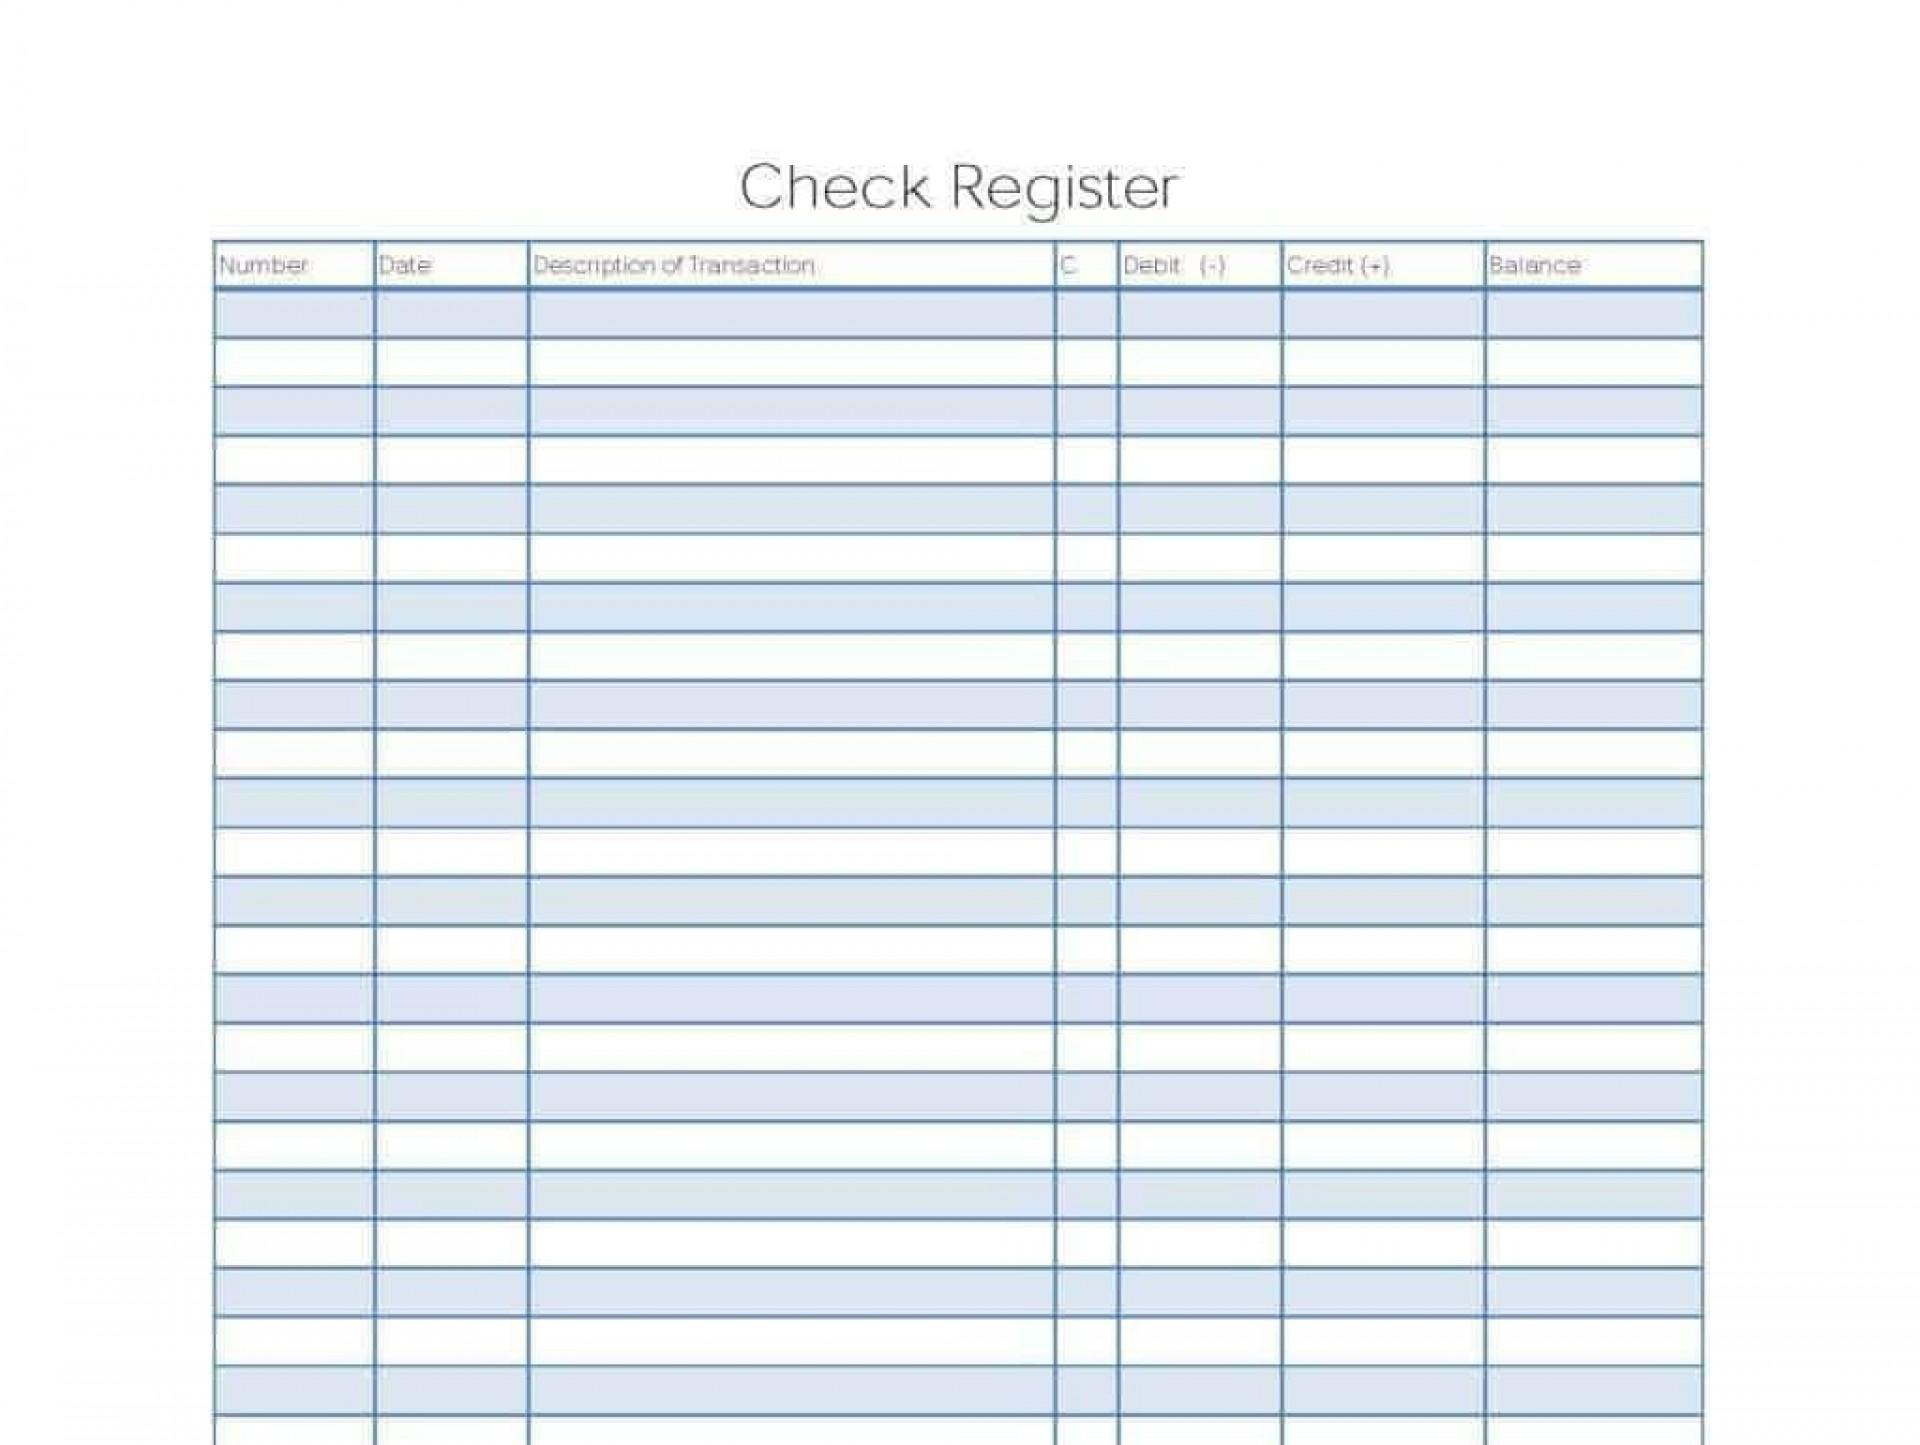 005 Amazing Checkbook Register Template Excel Design  Check 2007 Balance 20031920